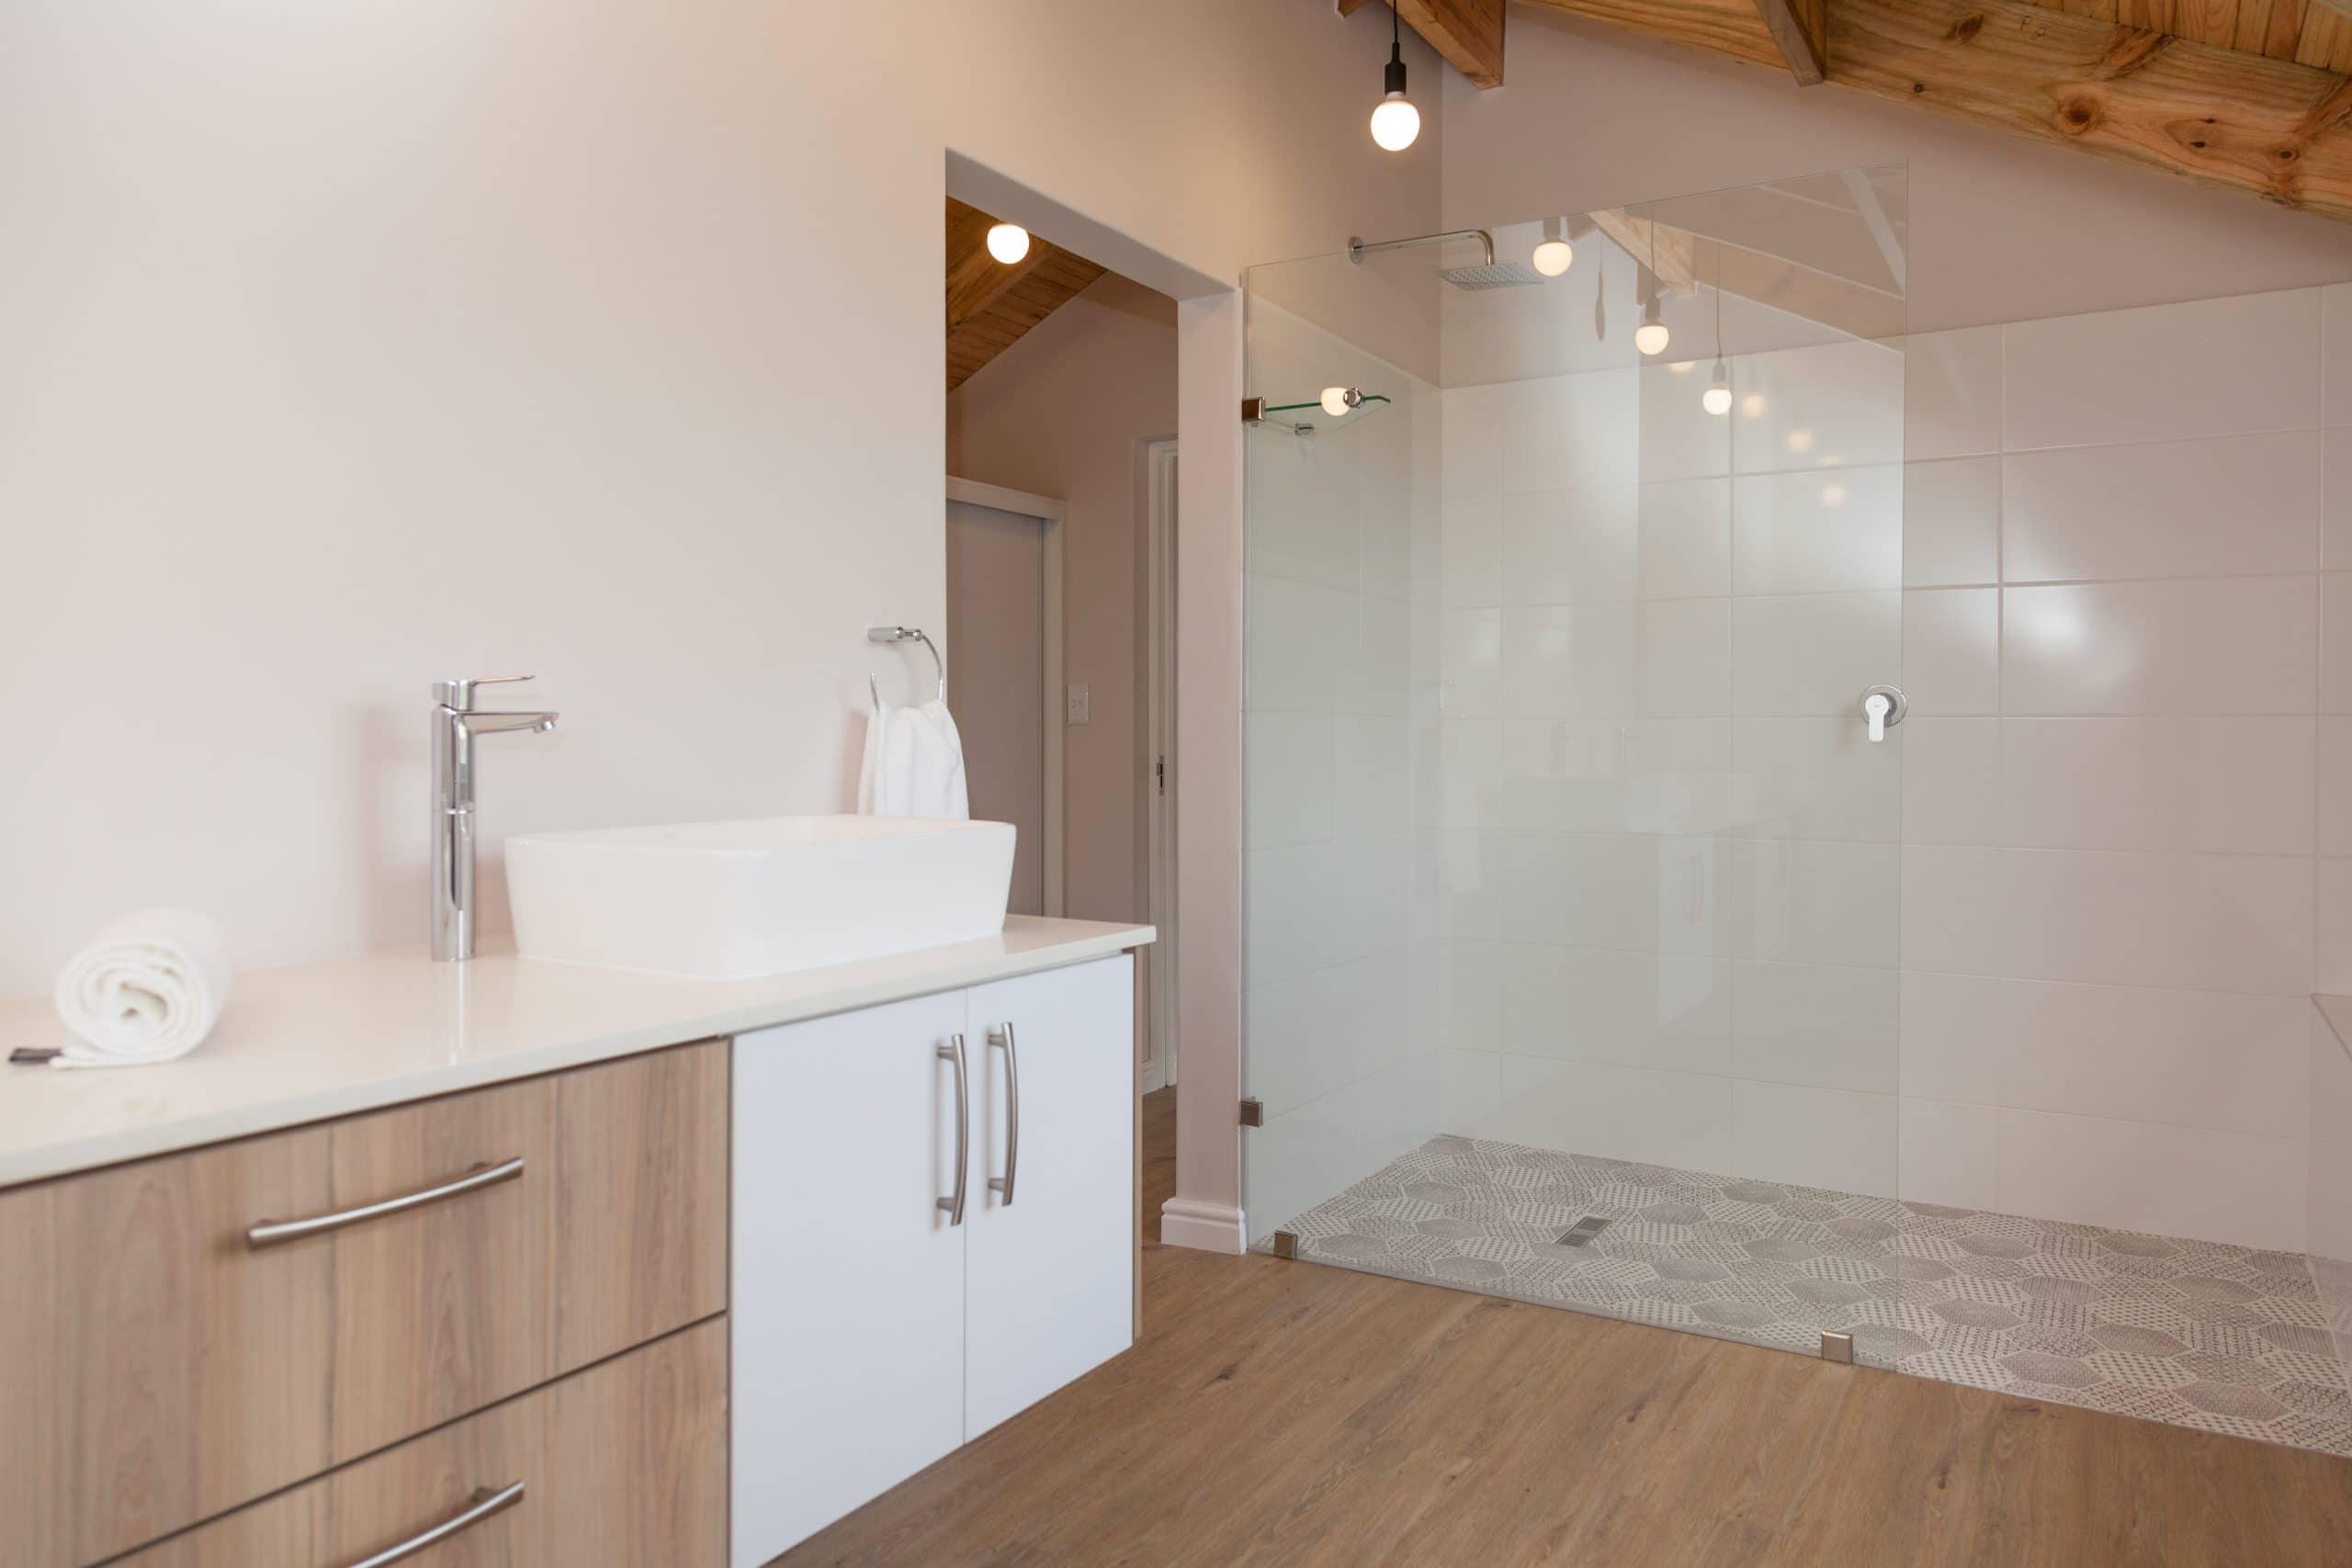 stiles styles shower flow with white wooden vanities open shower